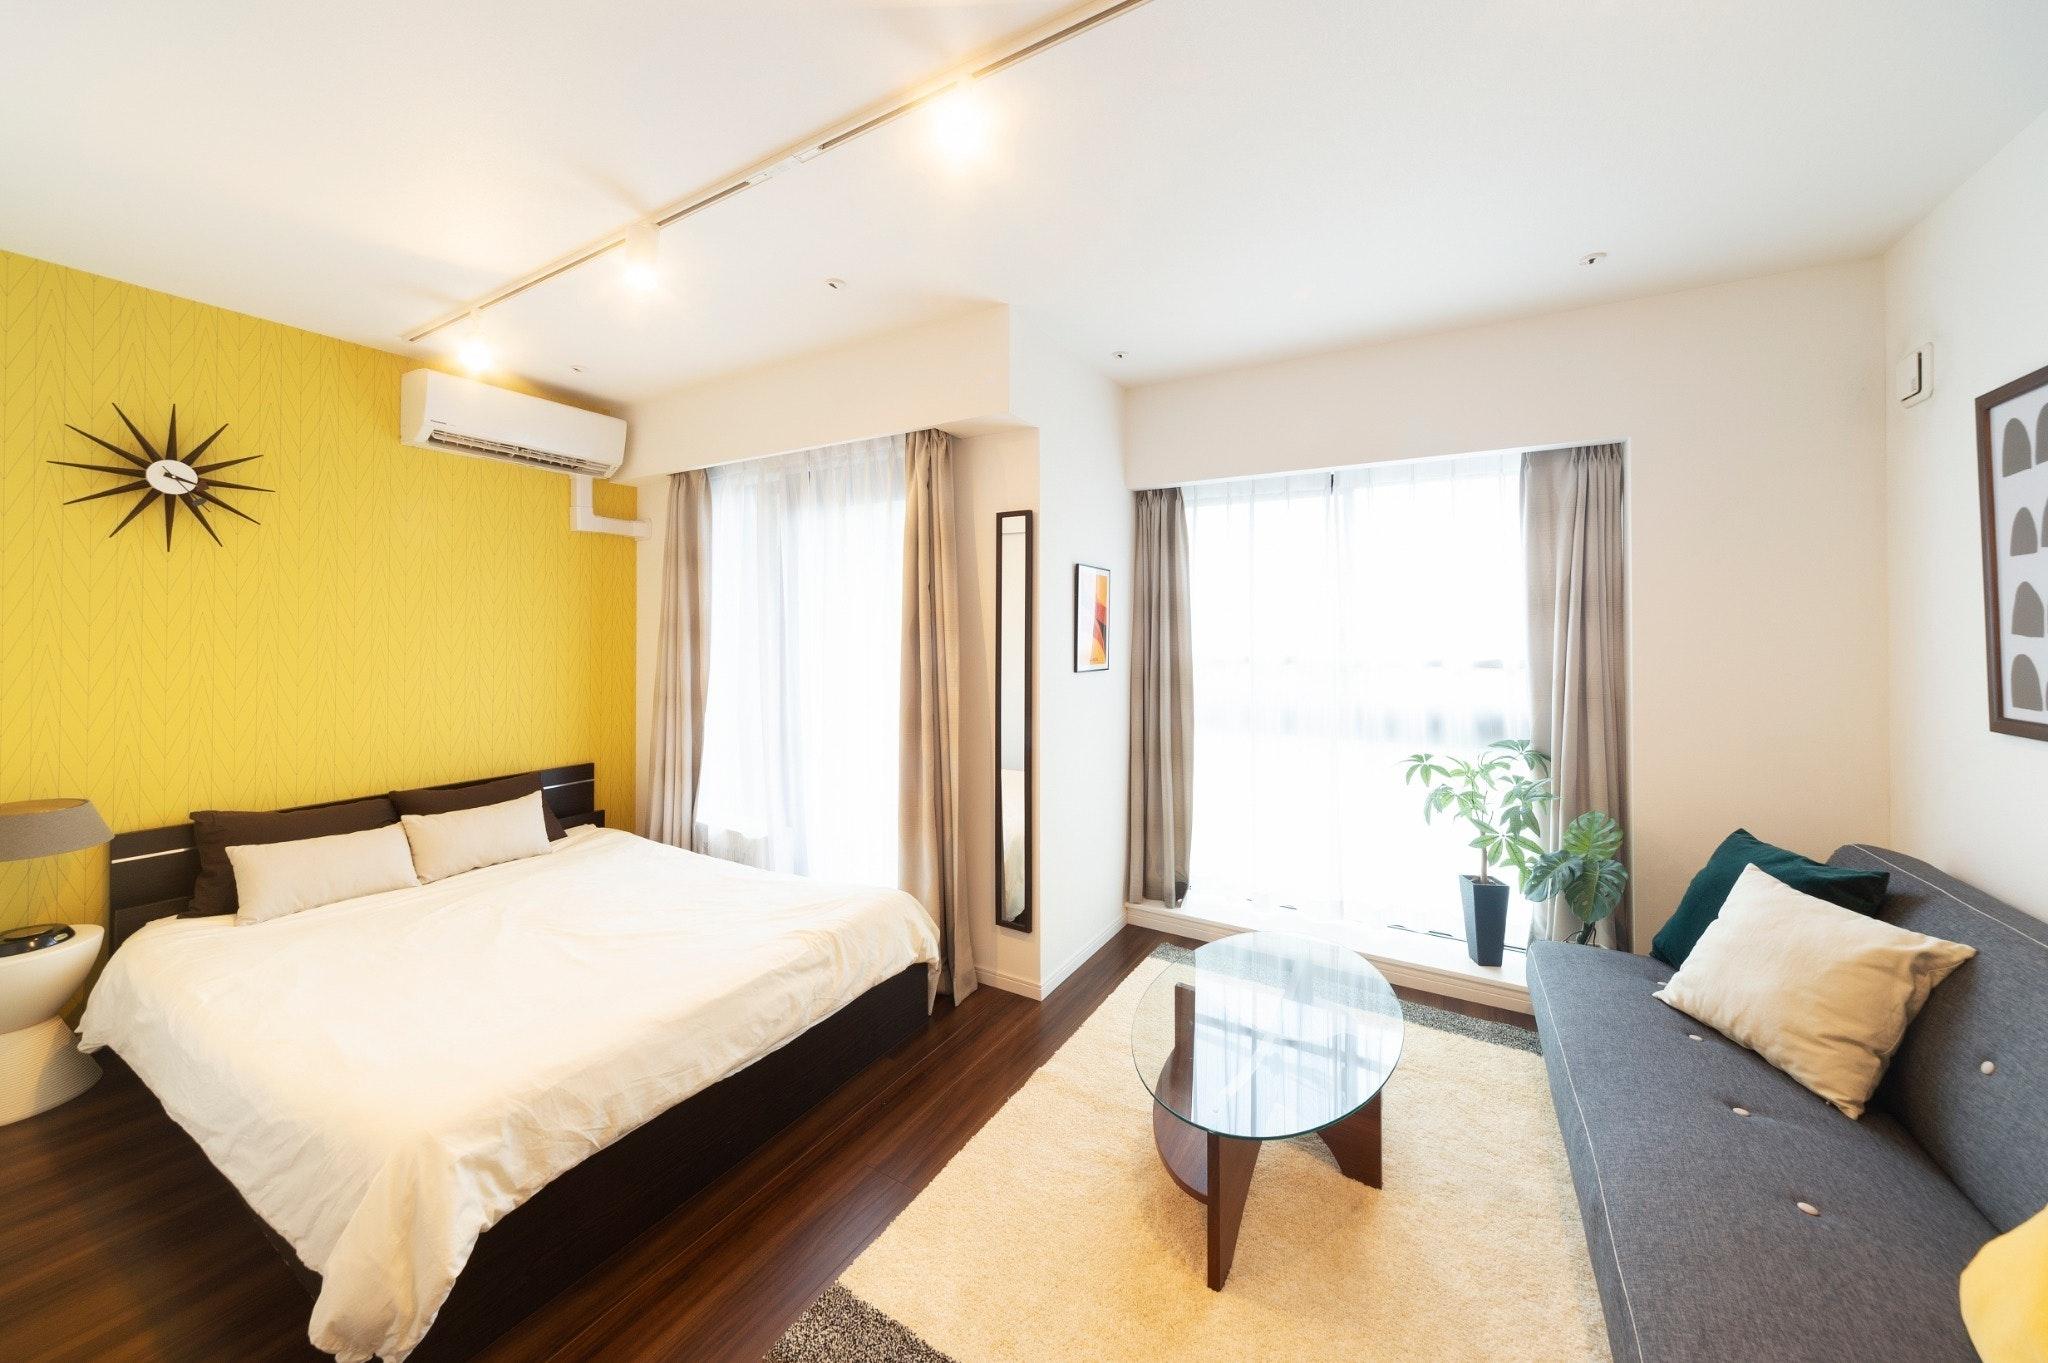 GH301*東中野駅、落合駅徒歩4分、キッチン、洗濯機付きの30平米1Kの住居型ホテル